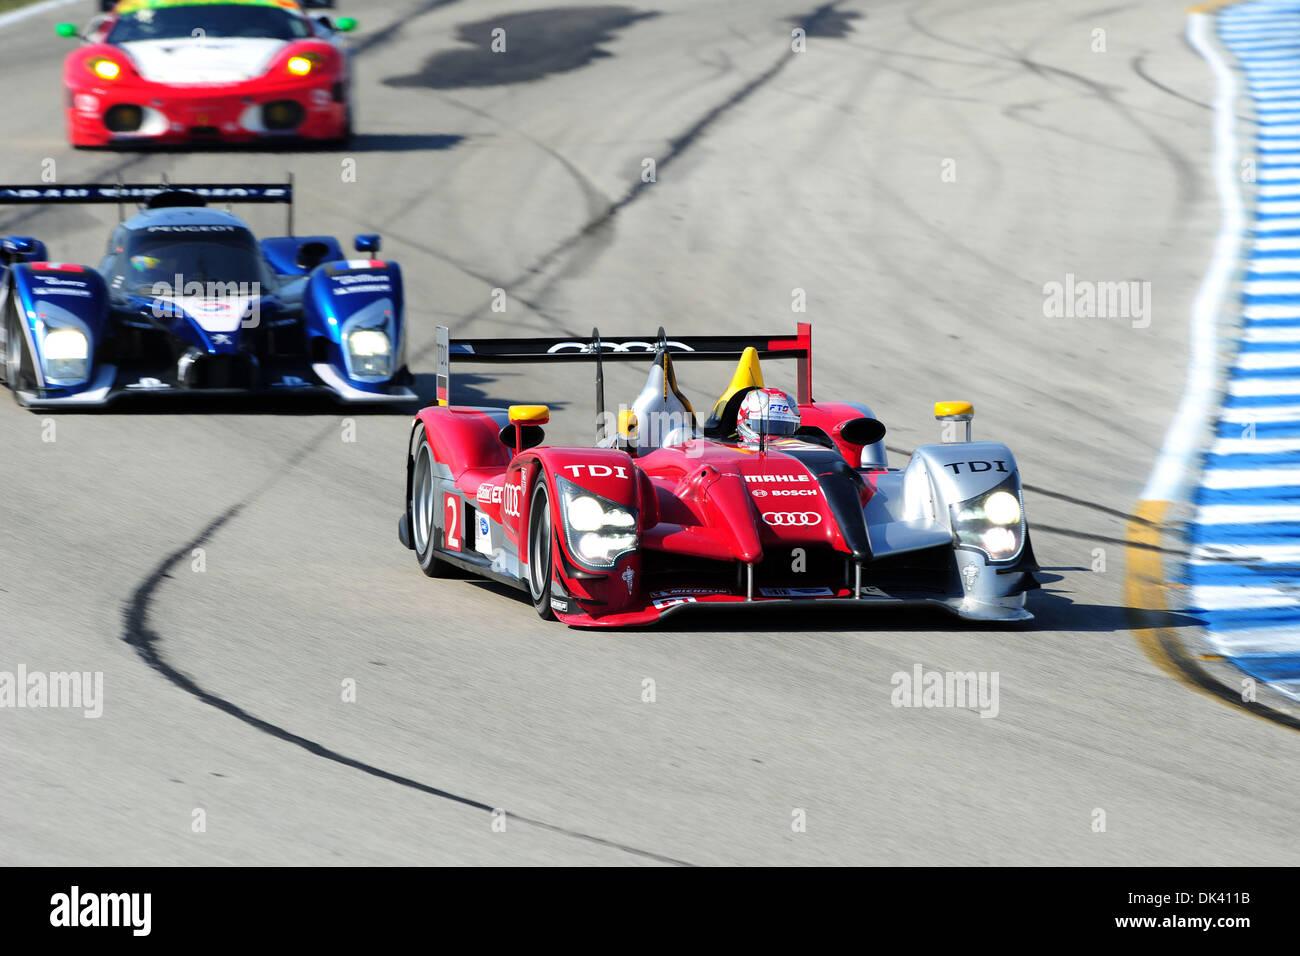 16. März 2011 - treibt Sebring, Florida, USA - Audi Sport Fahrer RINALDO CAPELLO, Italiens, der R15 Plus während Stockfoto